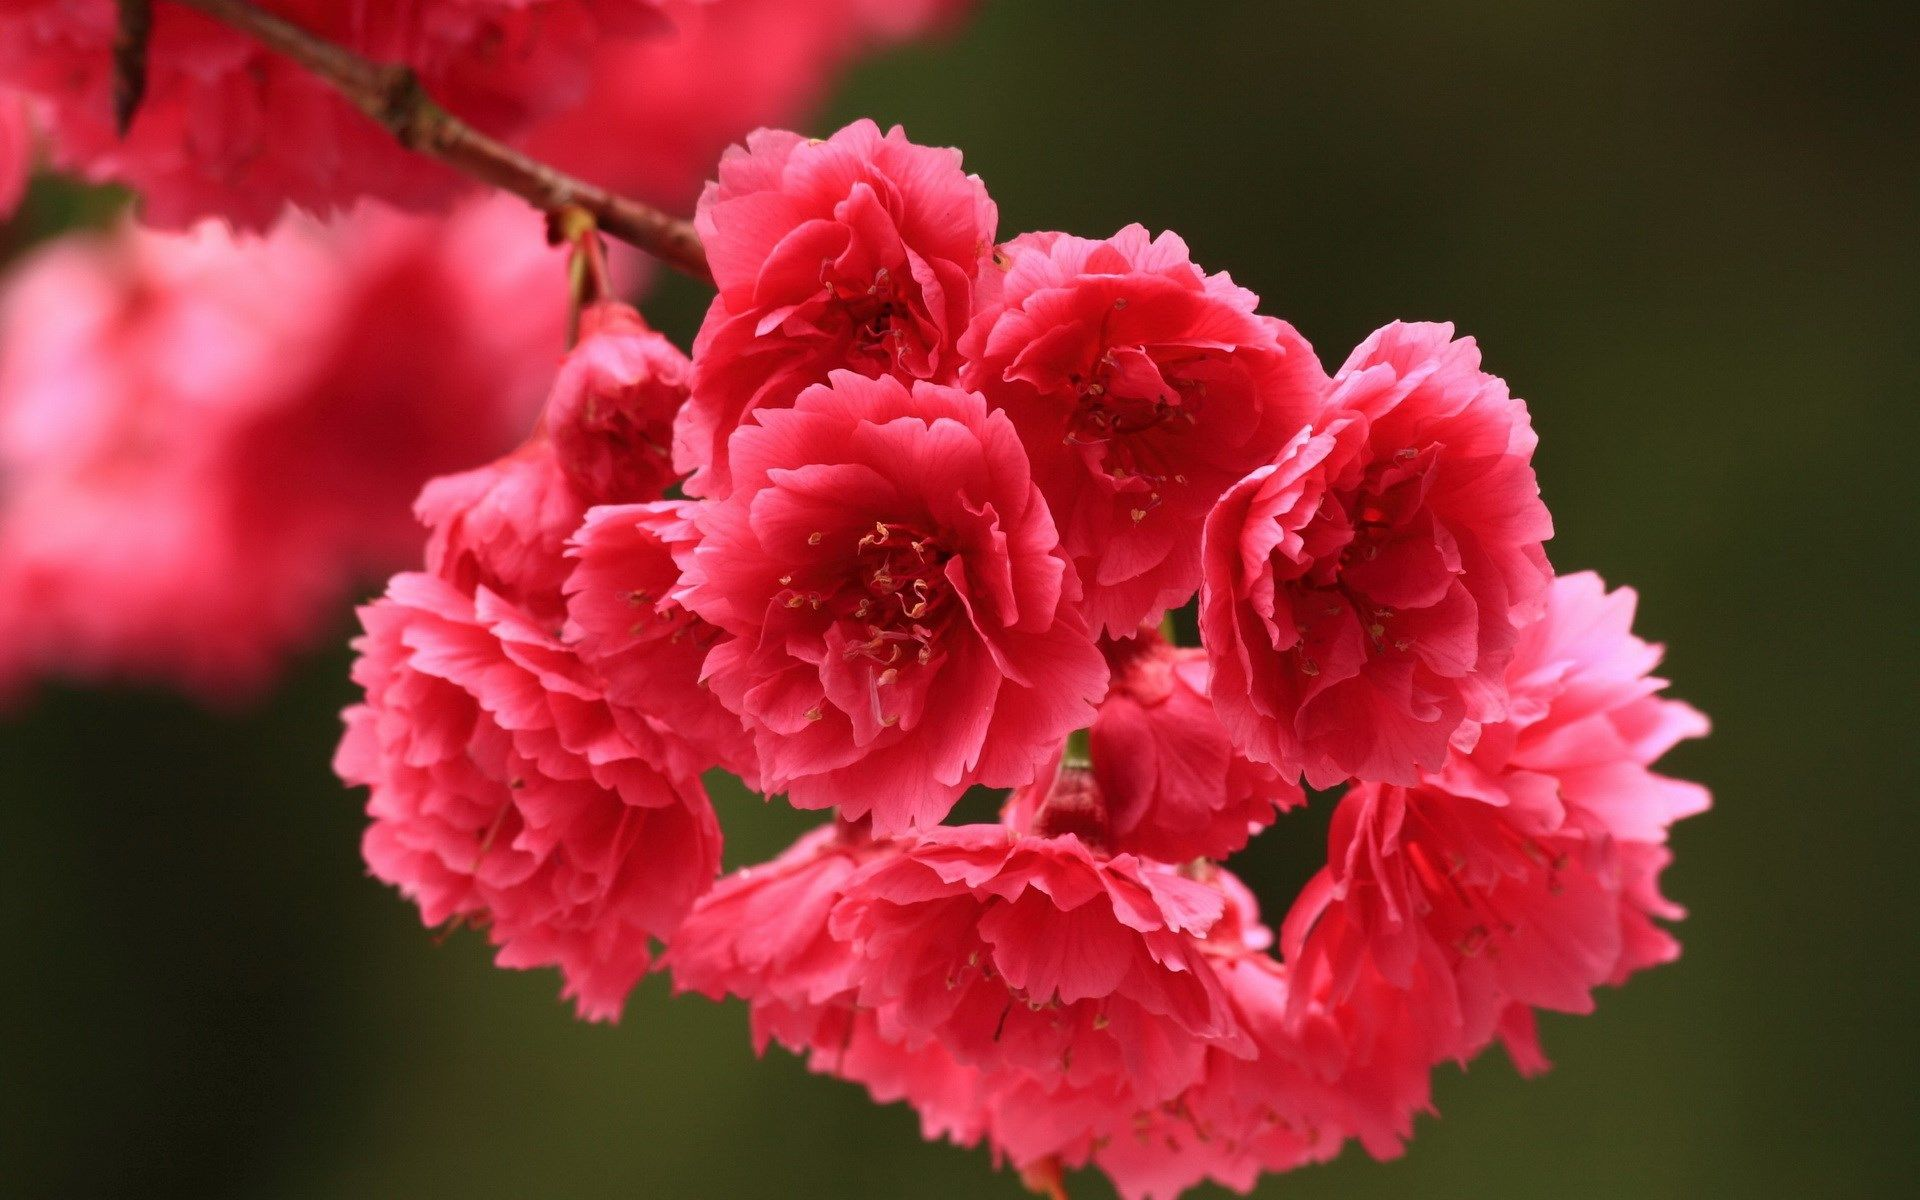 Flower To Download Scream Pinterest Flower Backgrounds